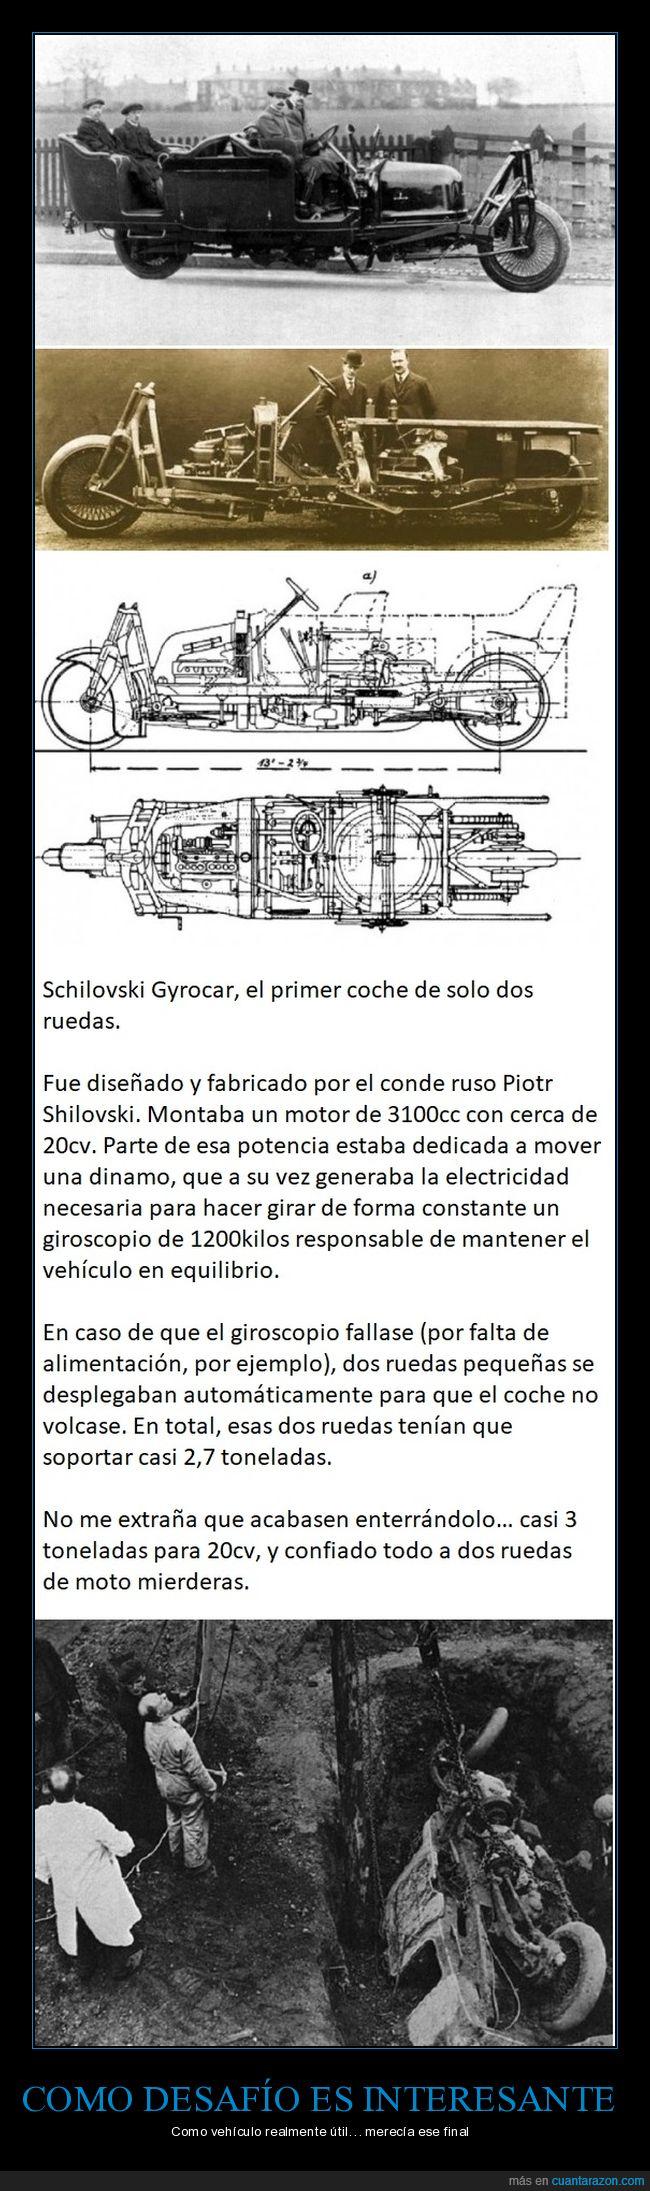 dos ruedas,Gyrocar,ingeniería,Rusos